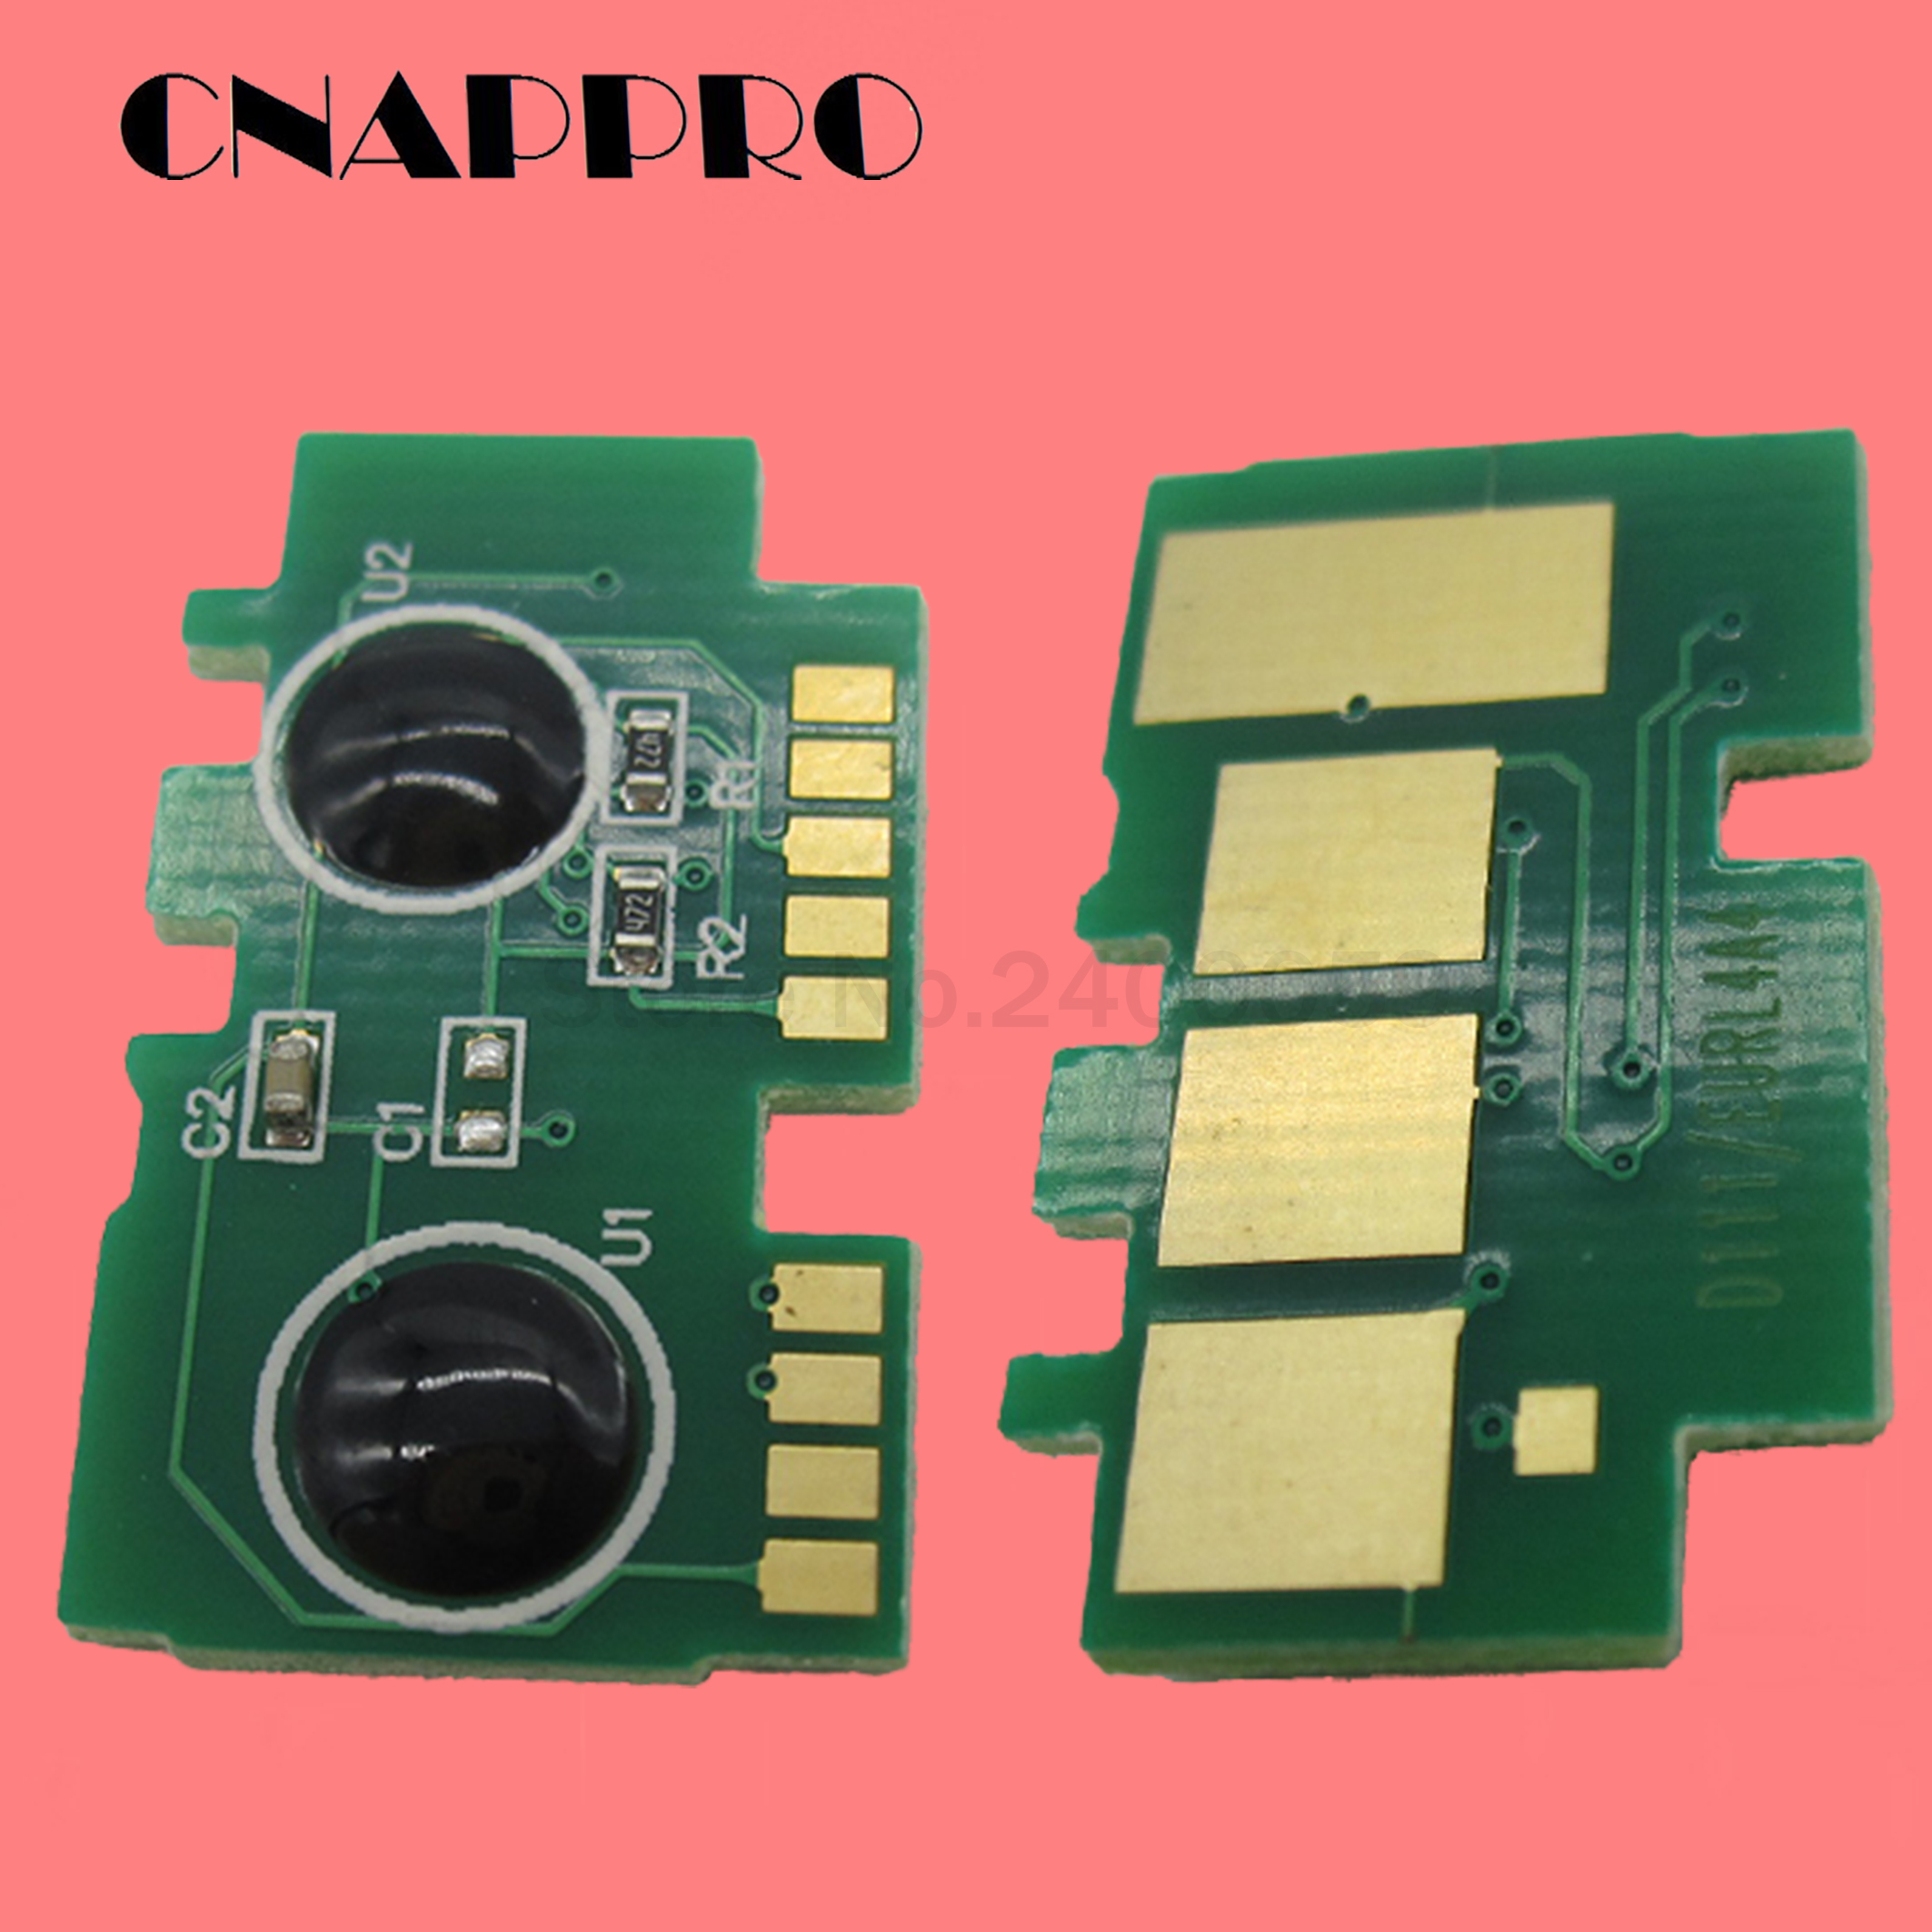 Mlt-d111s Mlt D111s D111 Toner Cartridge Chip For Samsung Xpress SL-M2020W SL-M2070W M2020W M2022 M2070 M2071 M2026 M2077 Reset